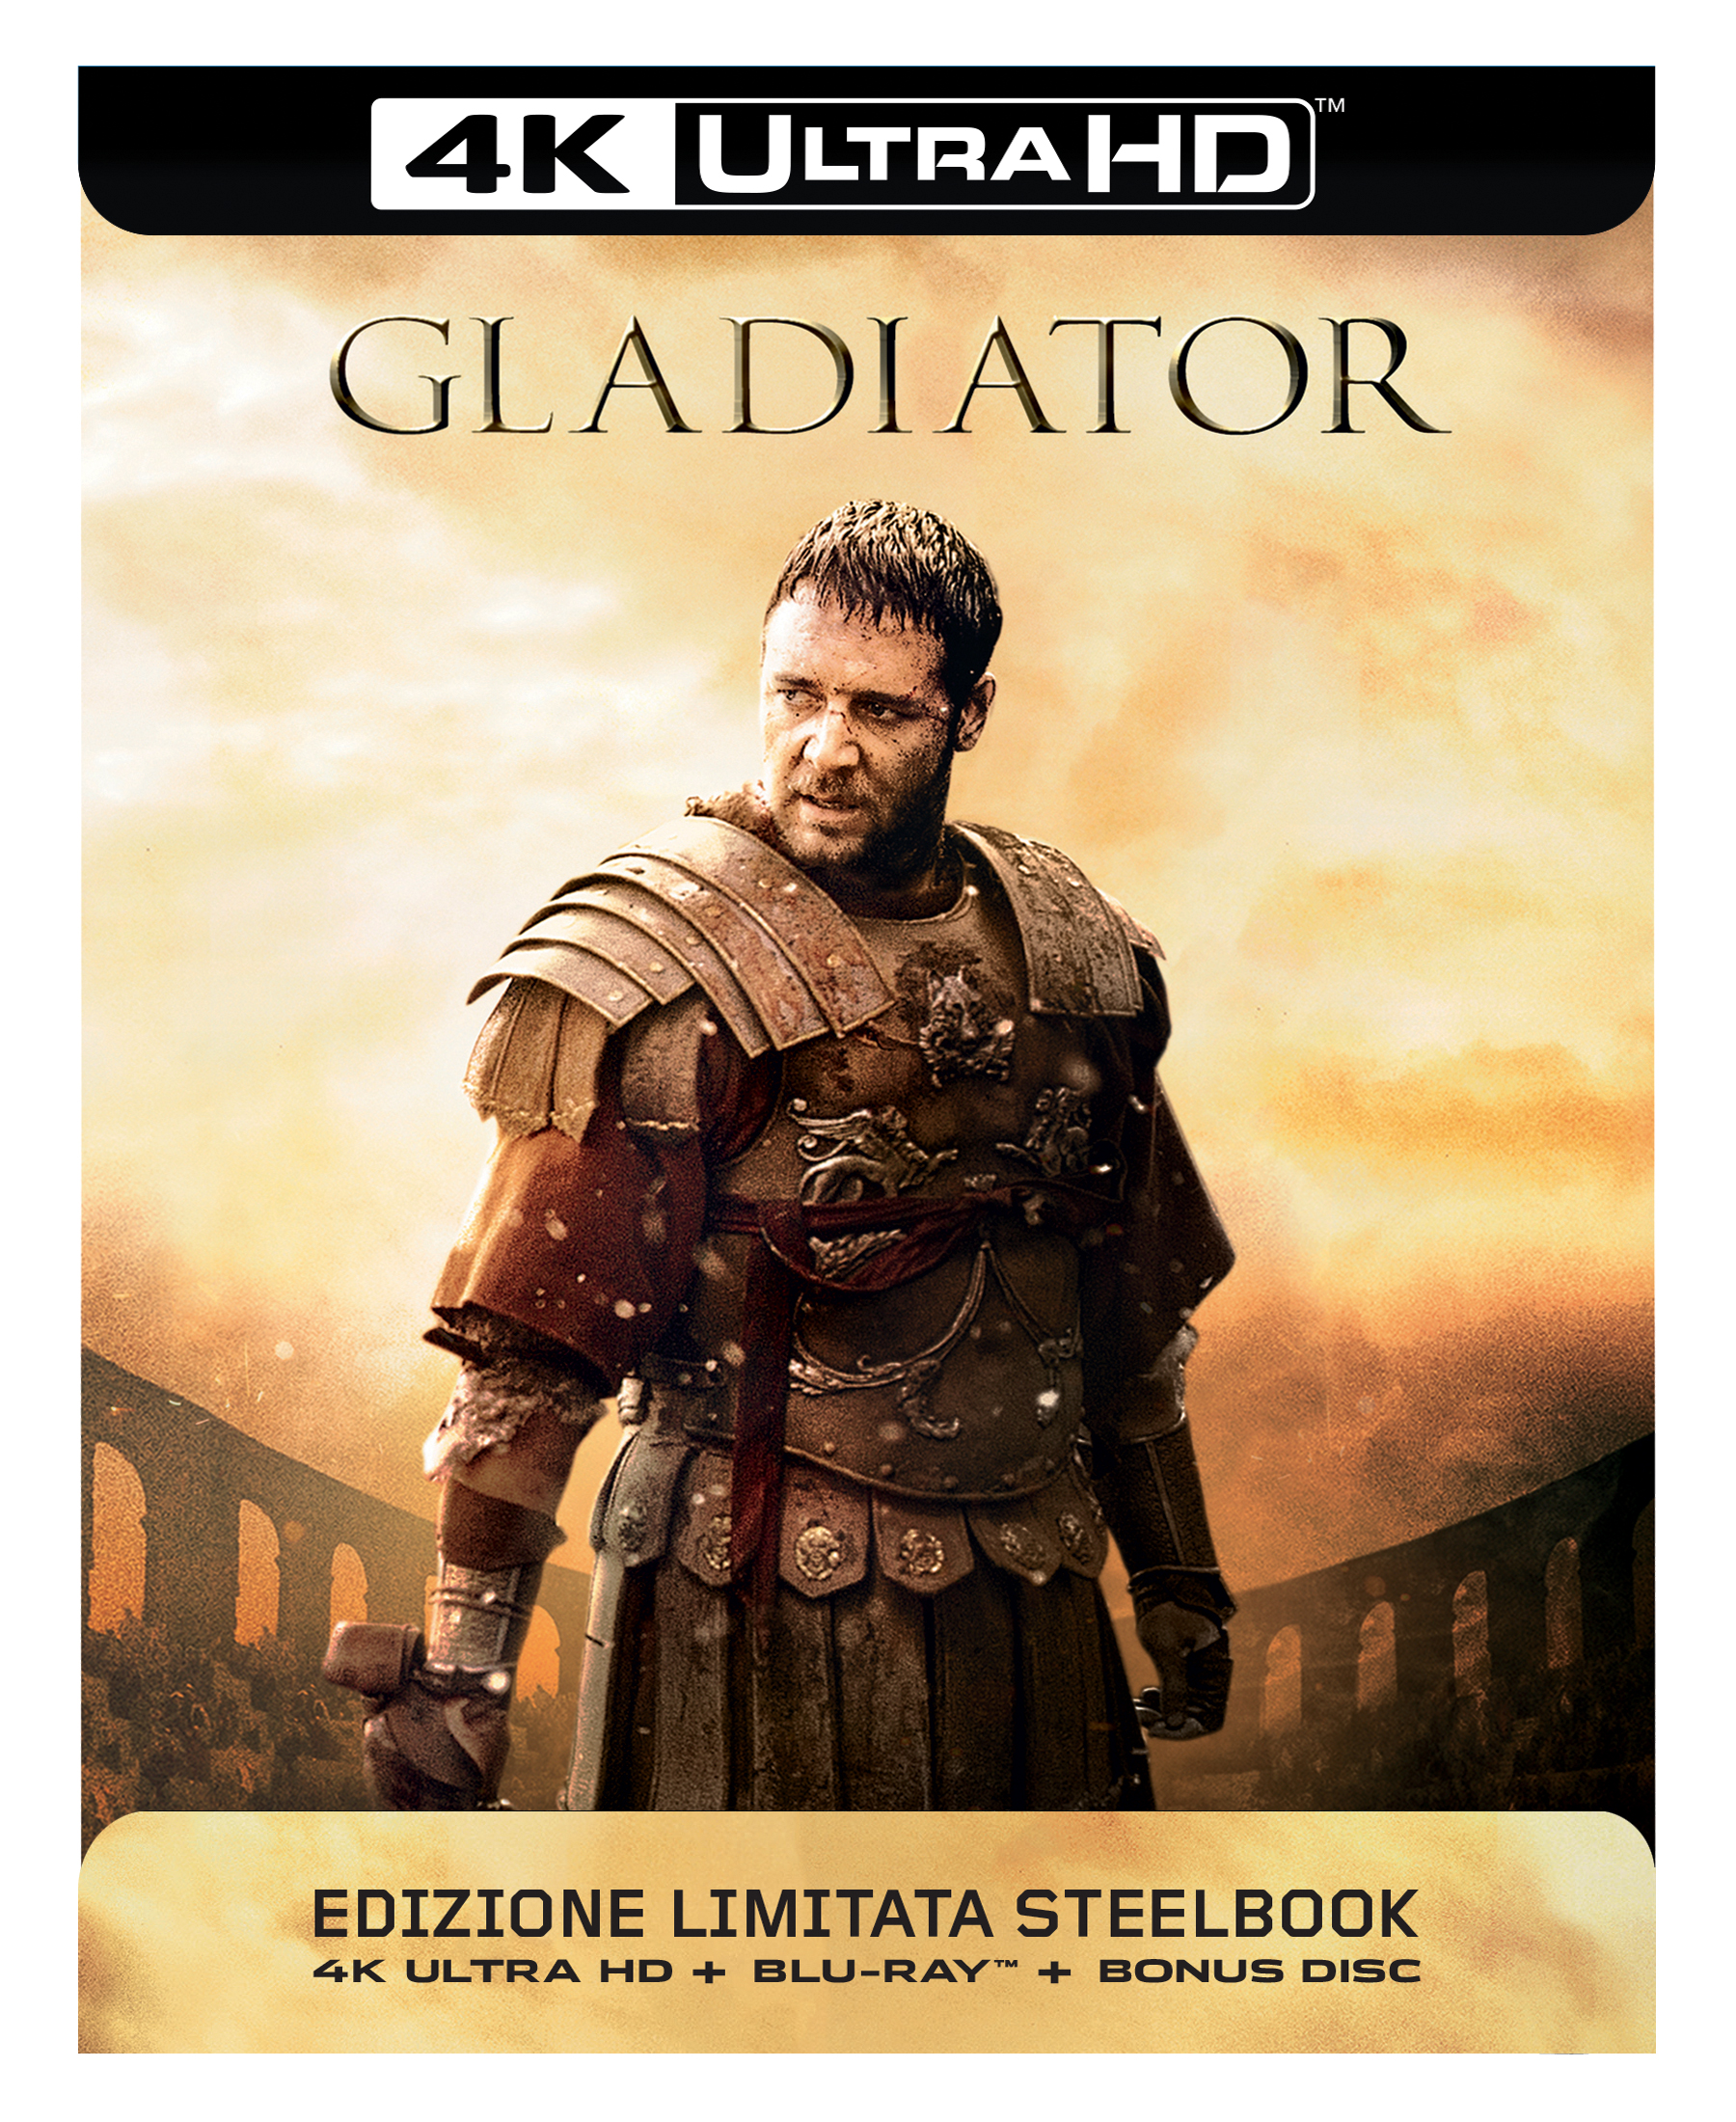 Gladiator_Ita_UHD-CCard_Ret_8310870-40_2D